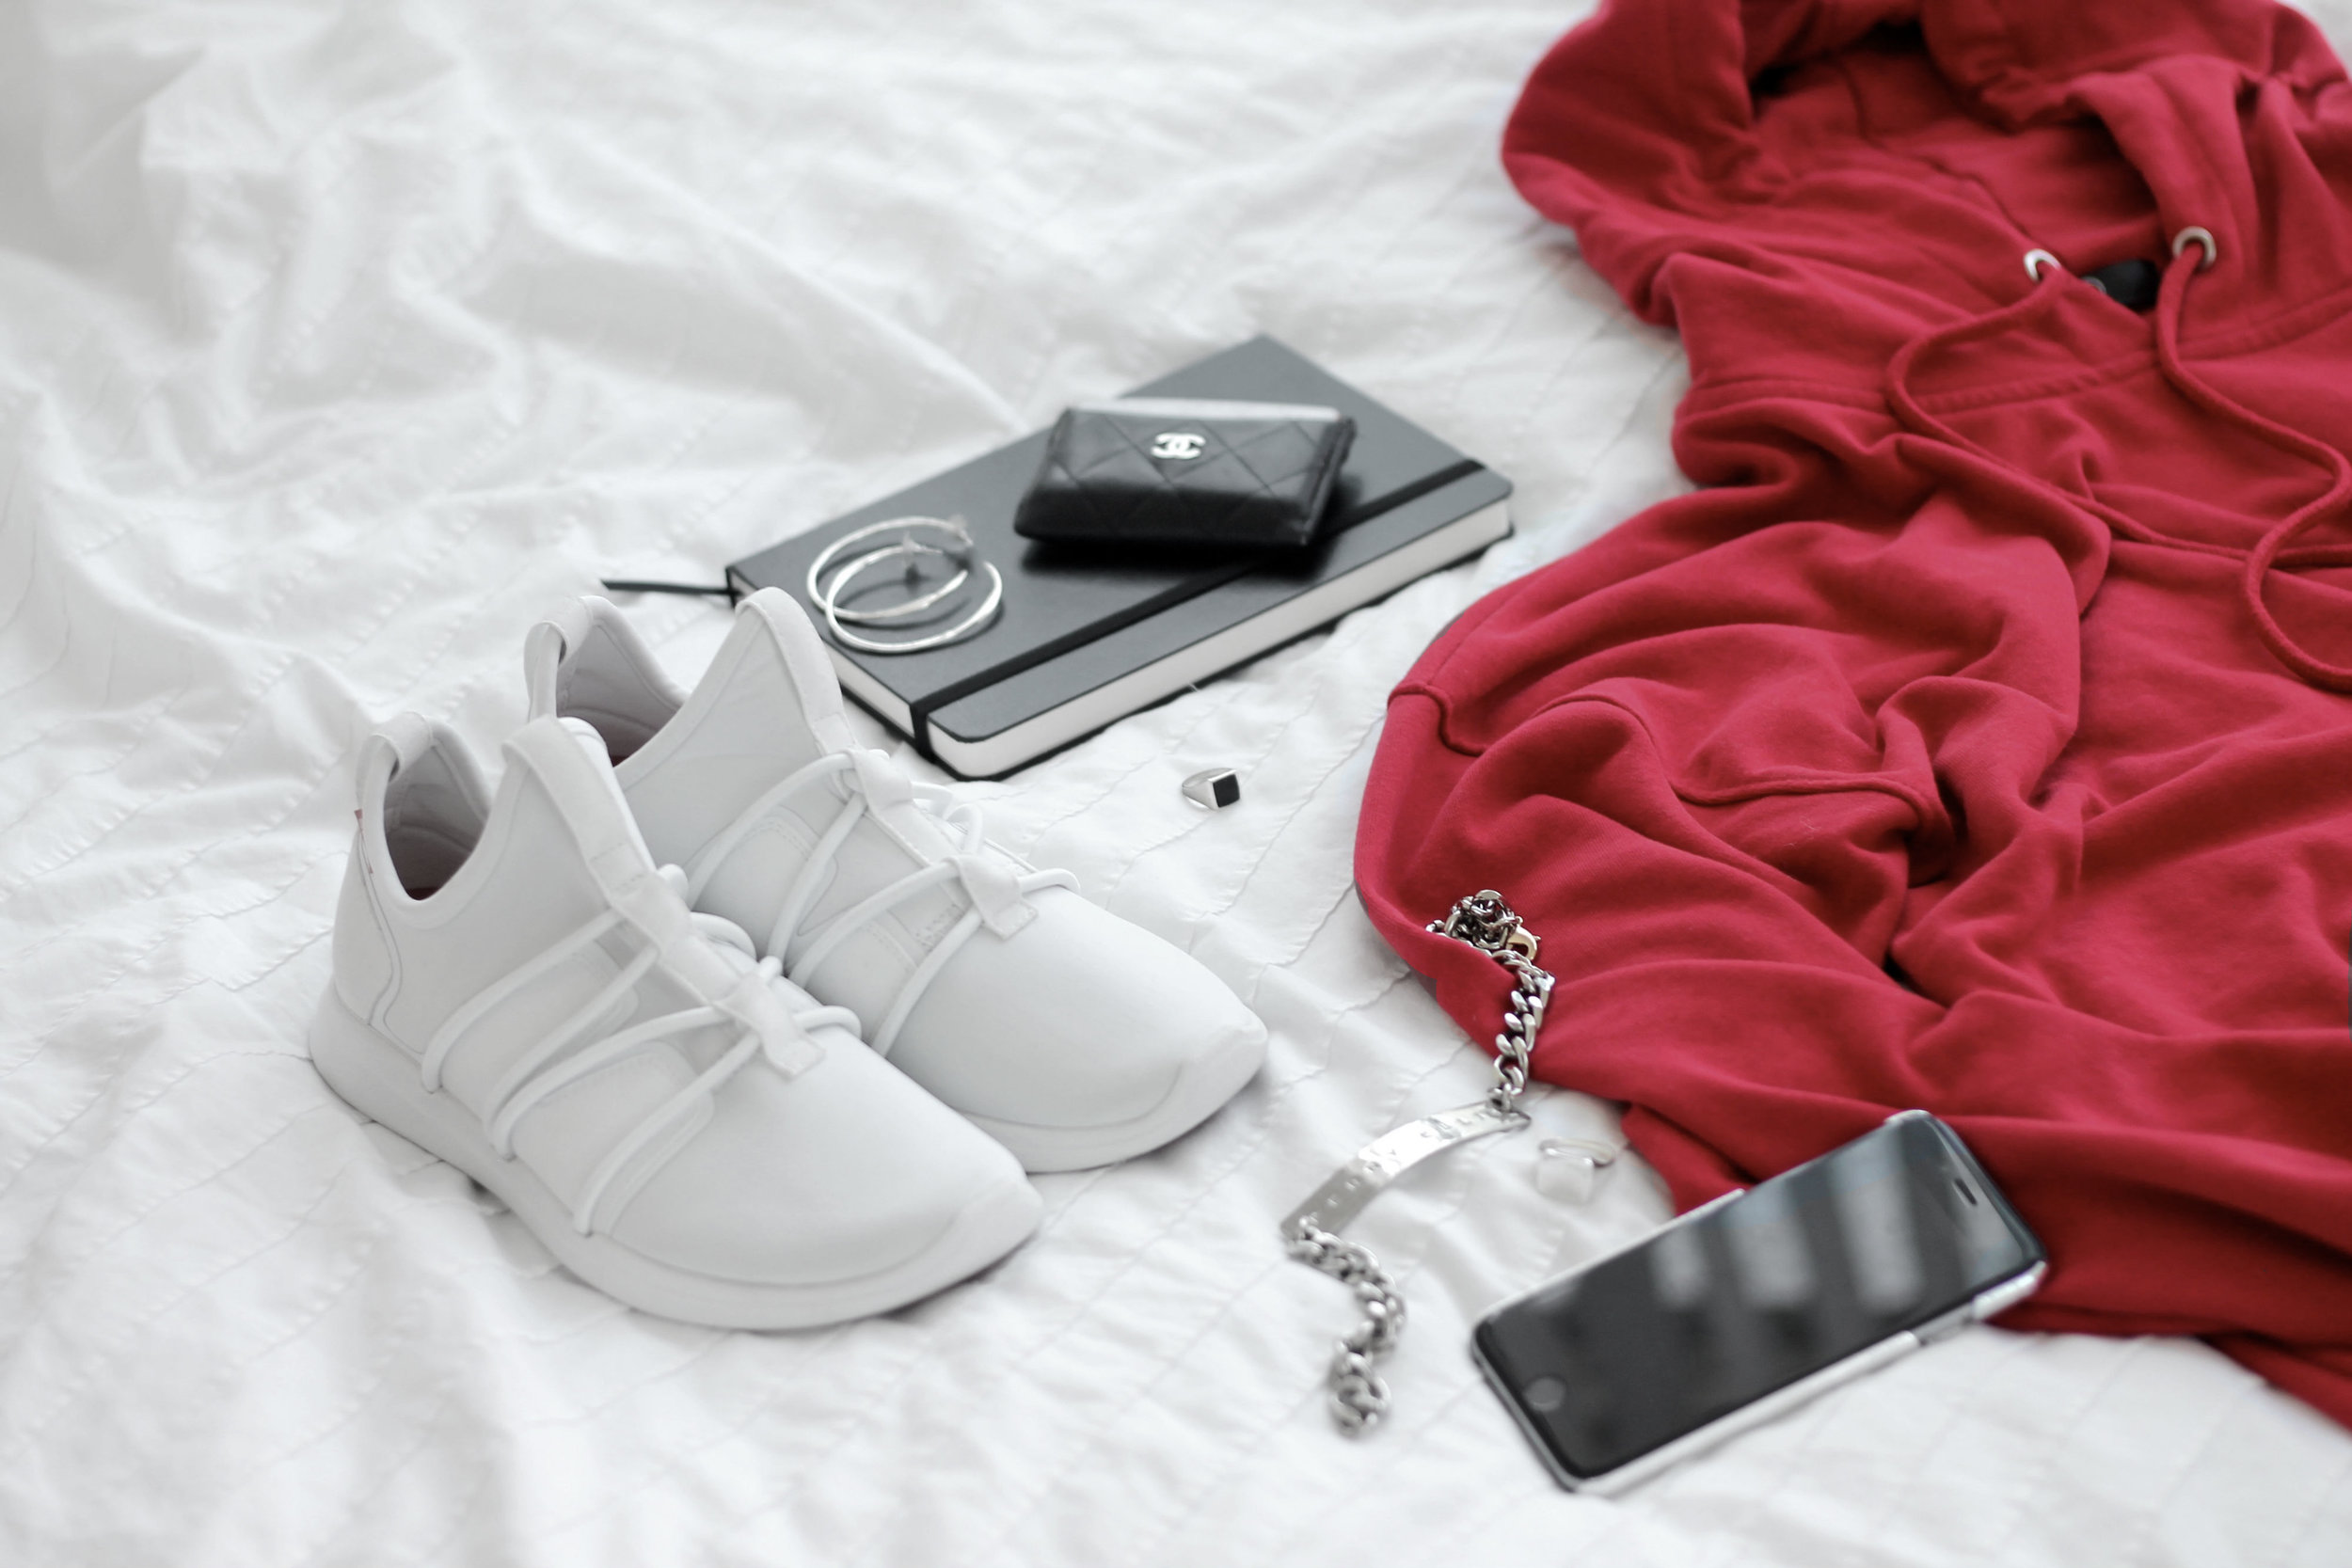 SKYE-Footwear-Canada-Rbutus-Bratty-B-1.jpg